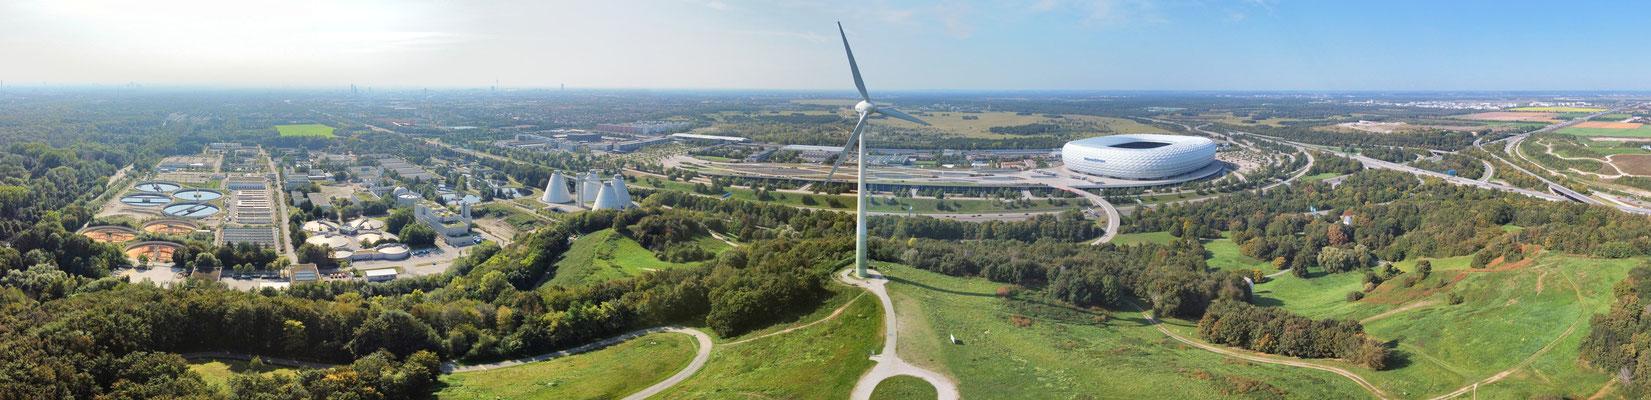 Panorama, Drohnenfoto, München, Allianz Arena, Fröttmaning, Windrad